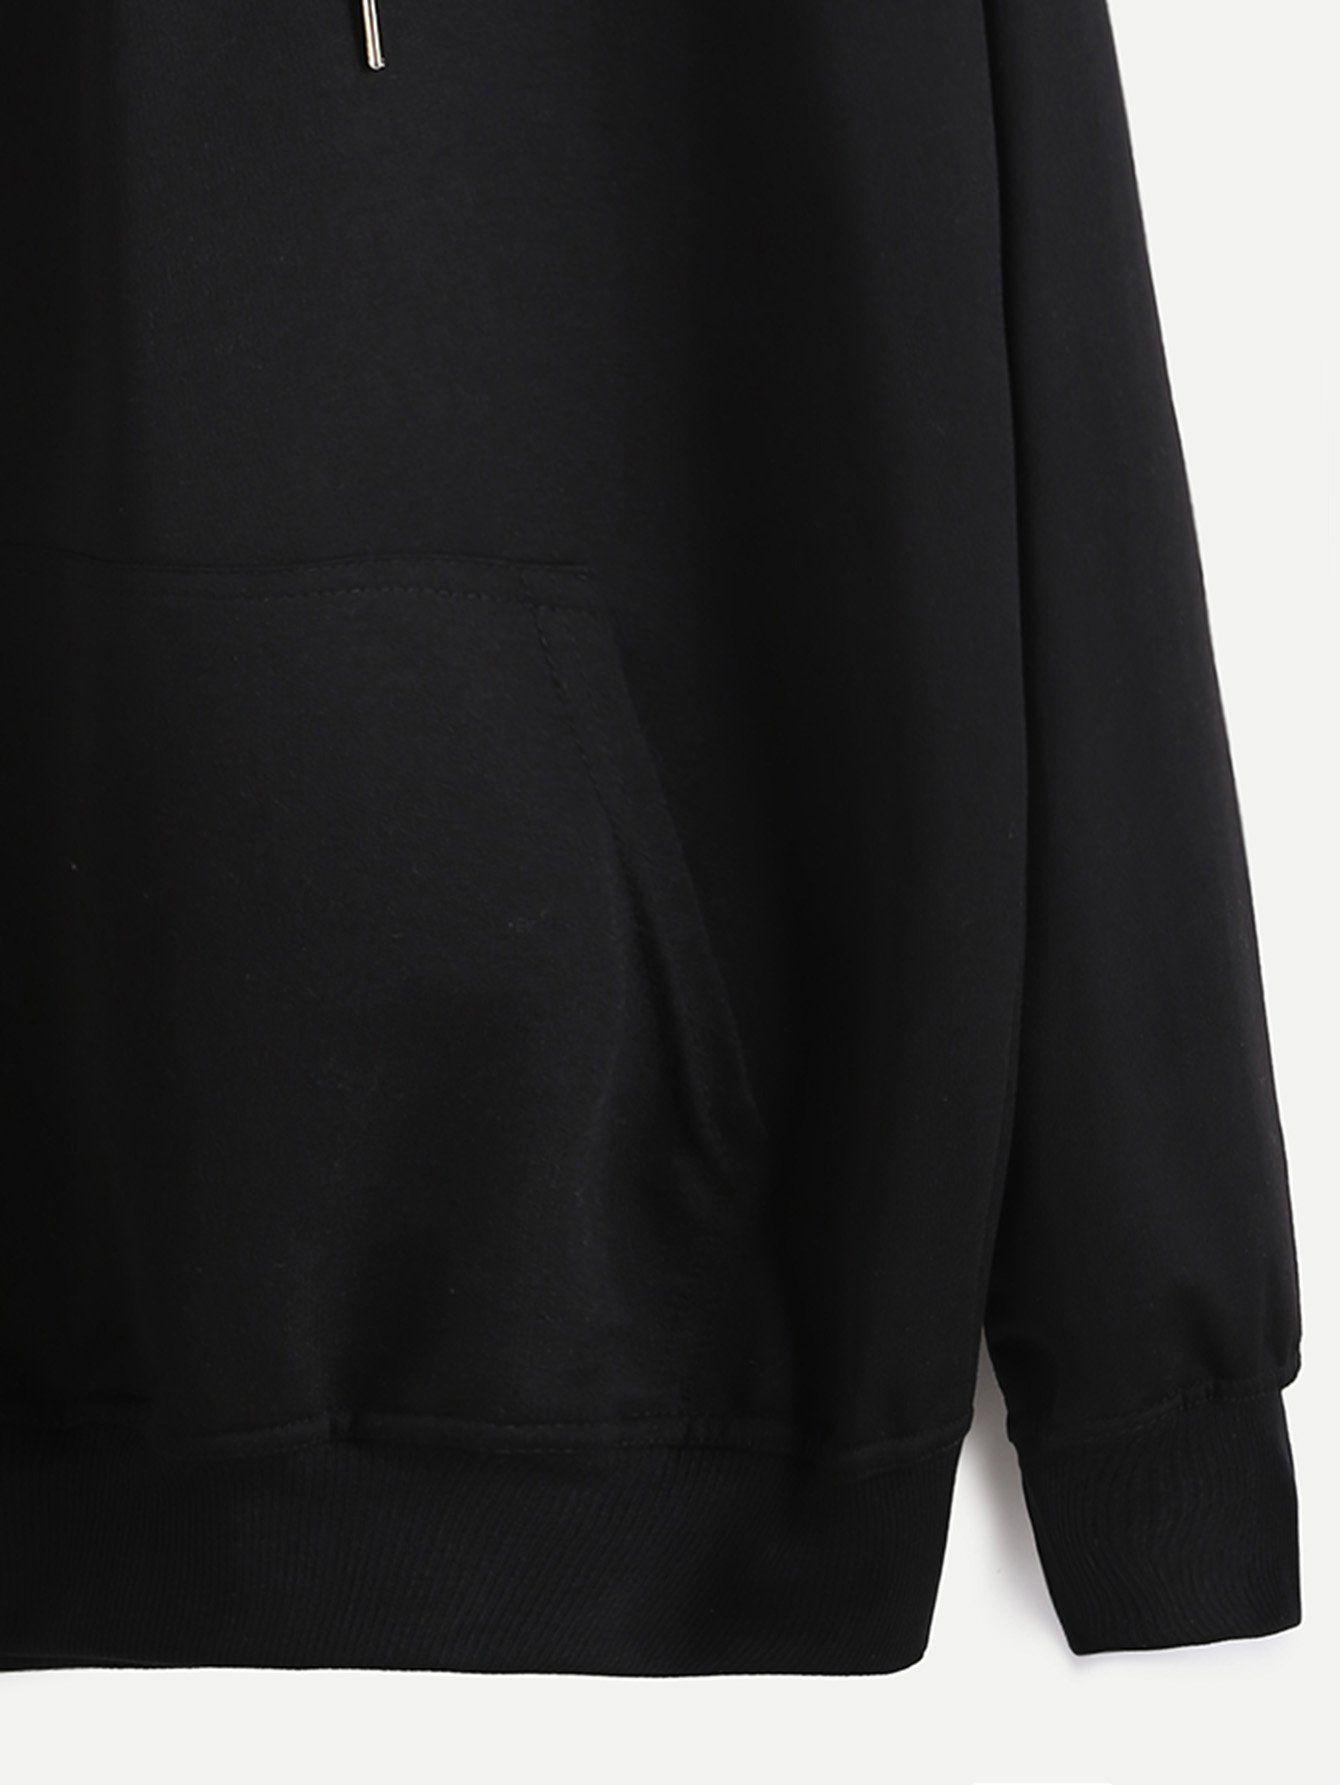 Black Hooded Drawstring Sweatshirt 3